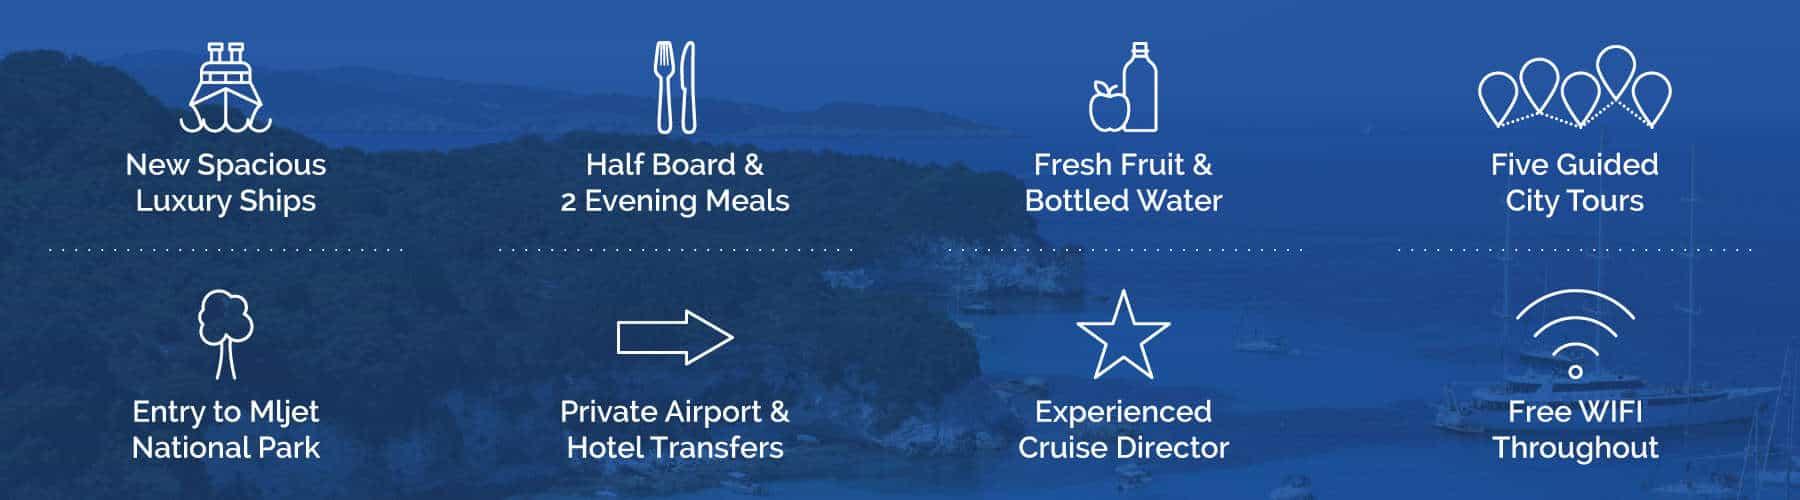 Croatia Luxury Cruise Inclusions Unforgettable Croatia